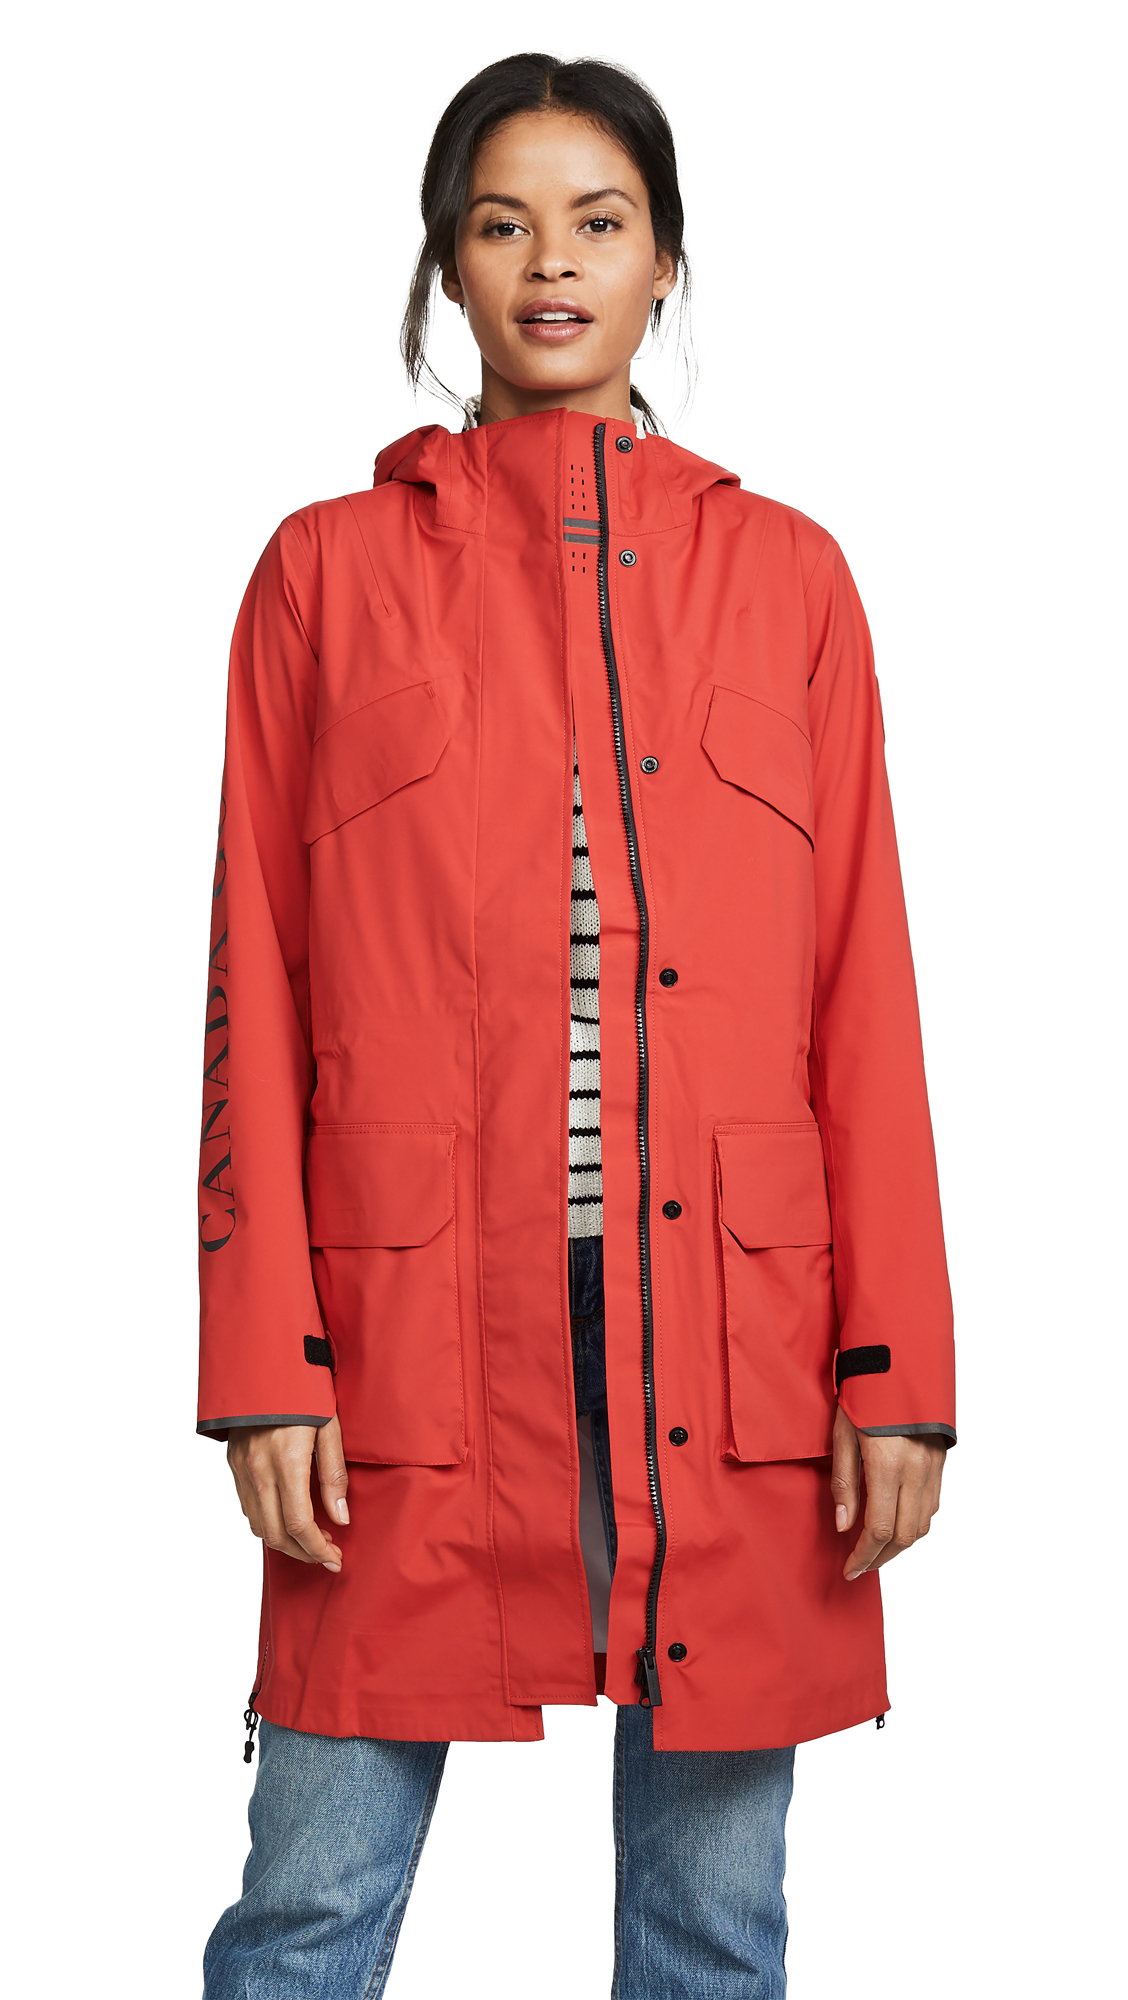 Canada Goose Seaboard Rain Jacket - Red